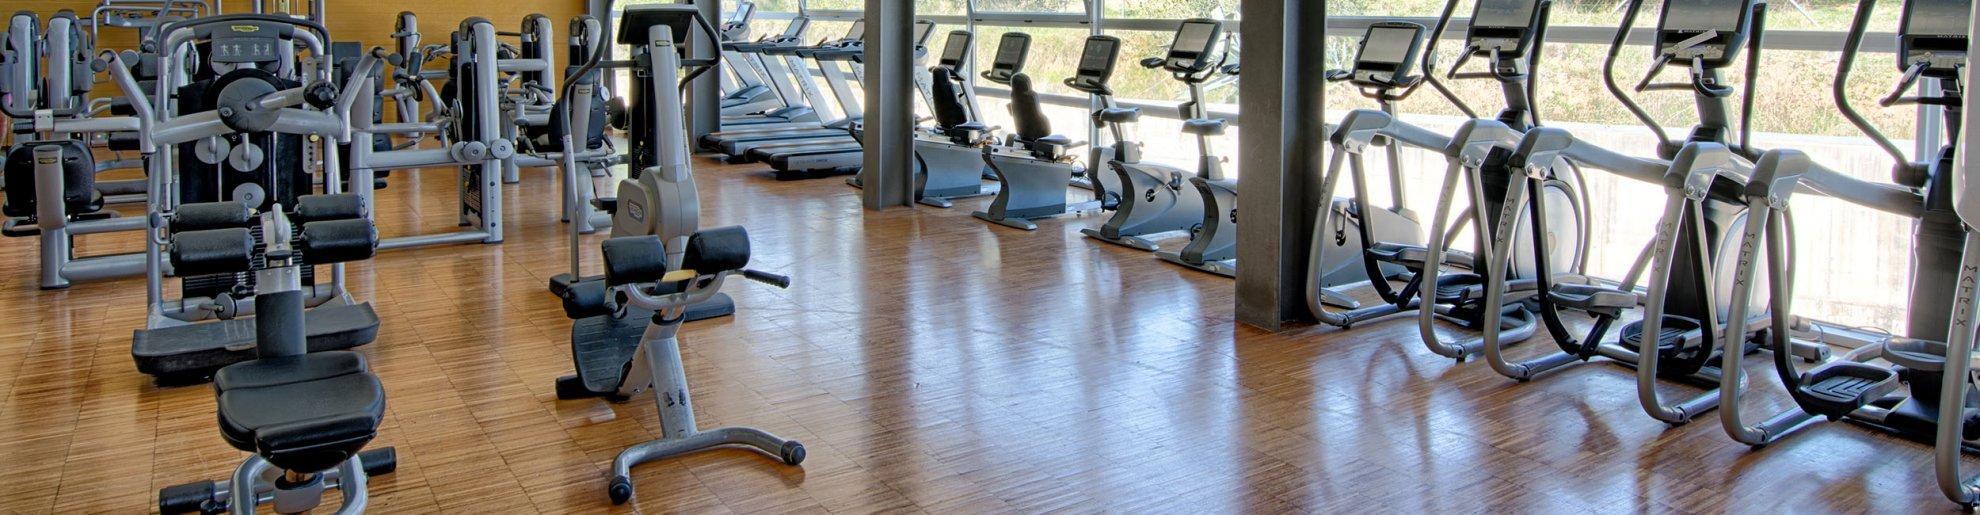 Instalaciones gimnasio accura sant boi ccura sant boi - Spa sant boi ...